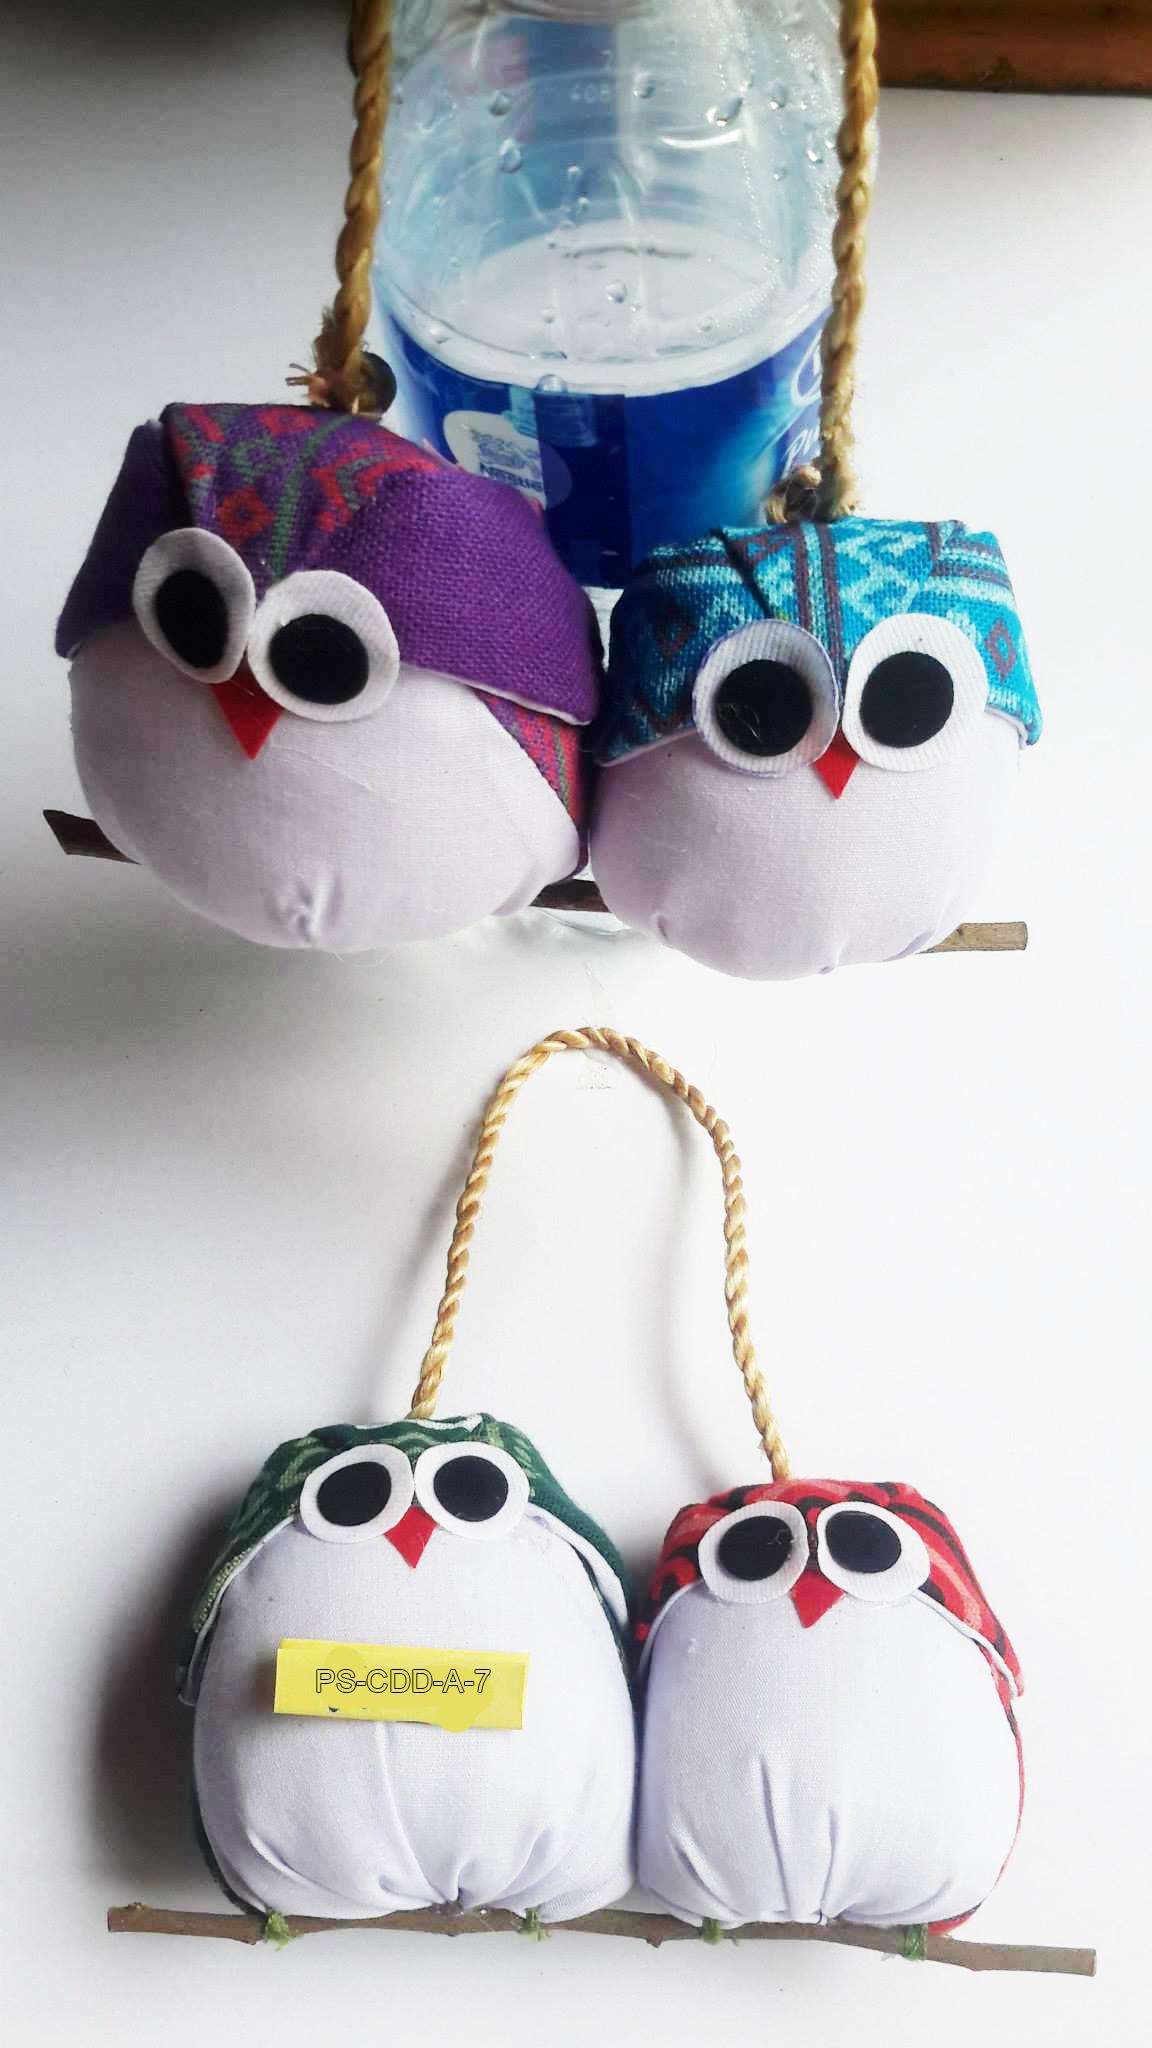 Cotton owl keyring-PS-DDA-7